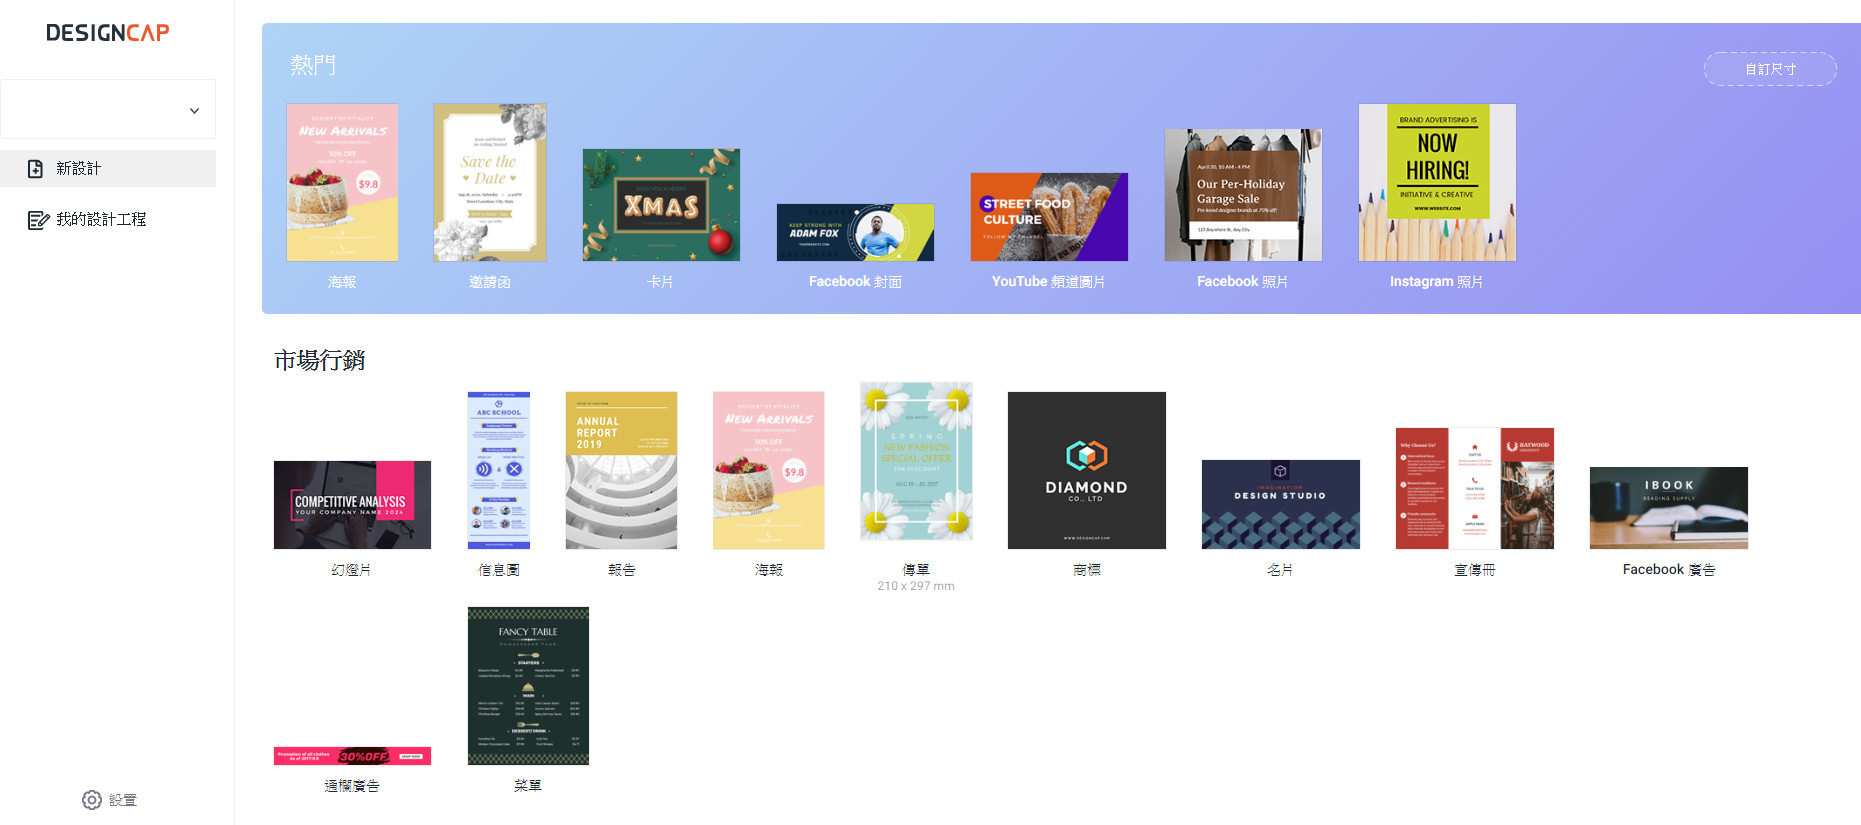 Design Cap 線上平面海報傳單設計工具-選擇設計|鯊客科技SEO優化網頁設計公司